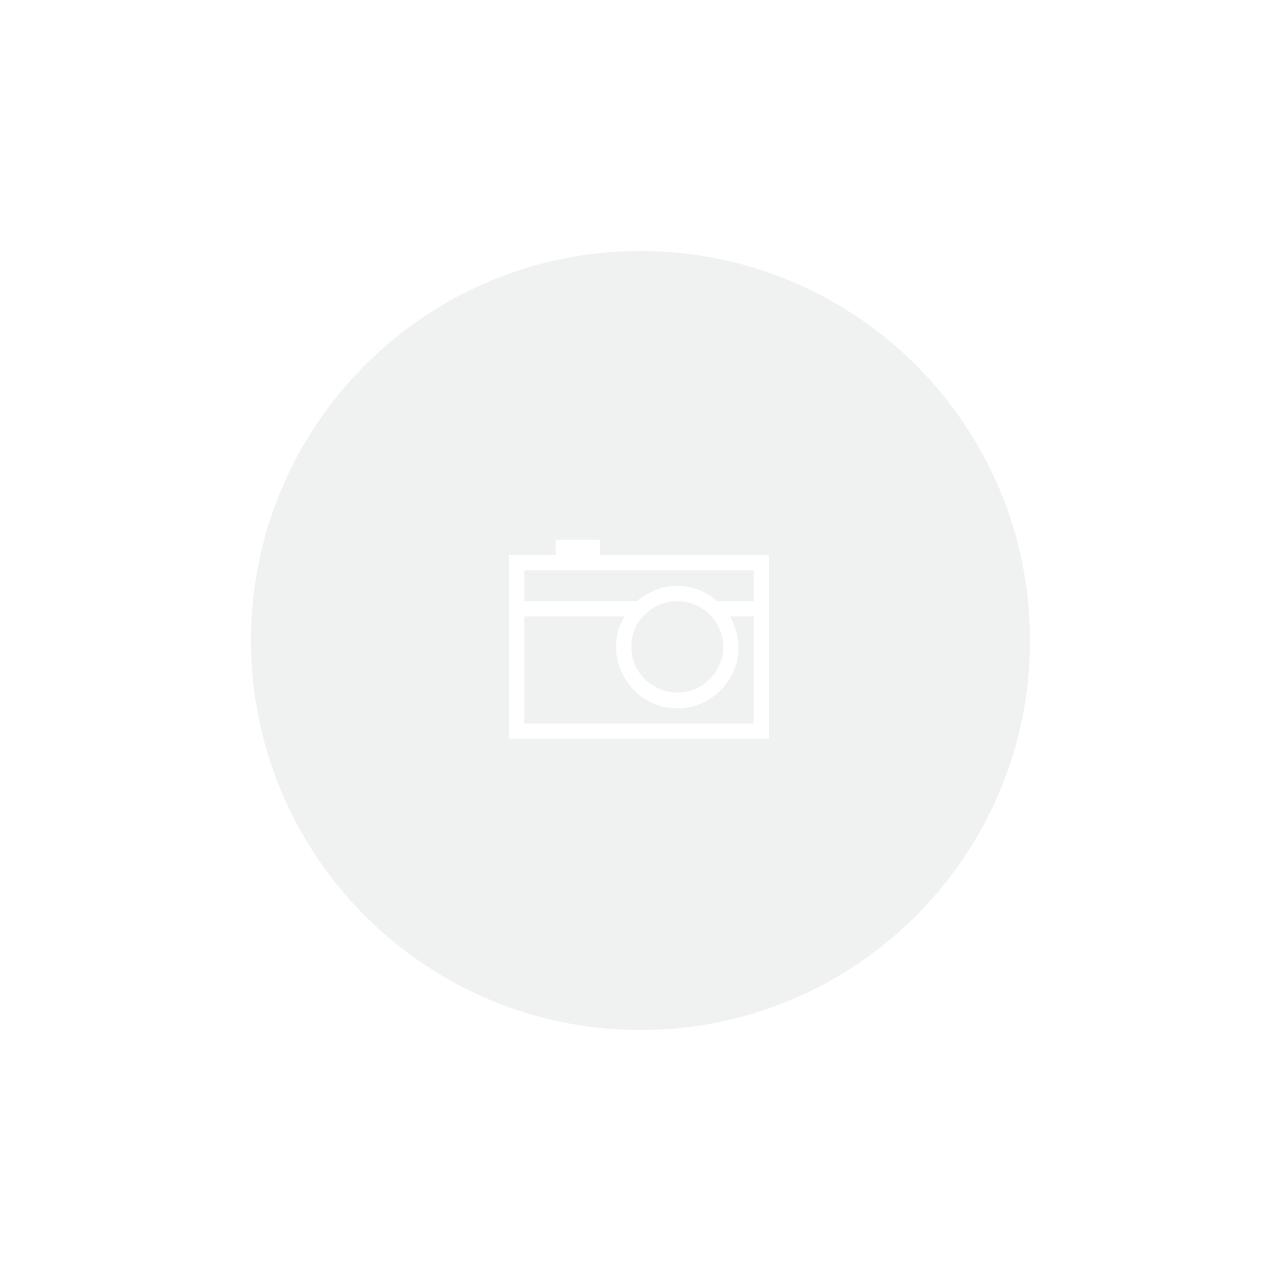 SELANTE NOTUBES GALAO RACE (946ML)